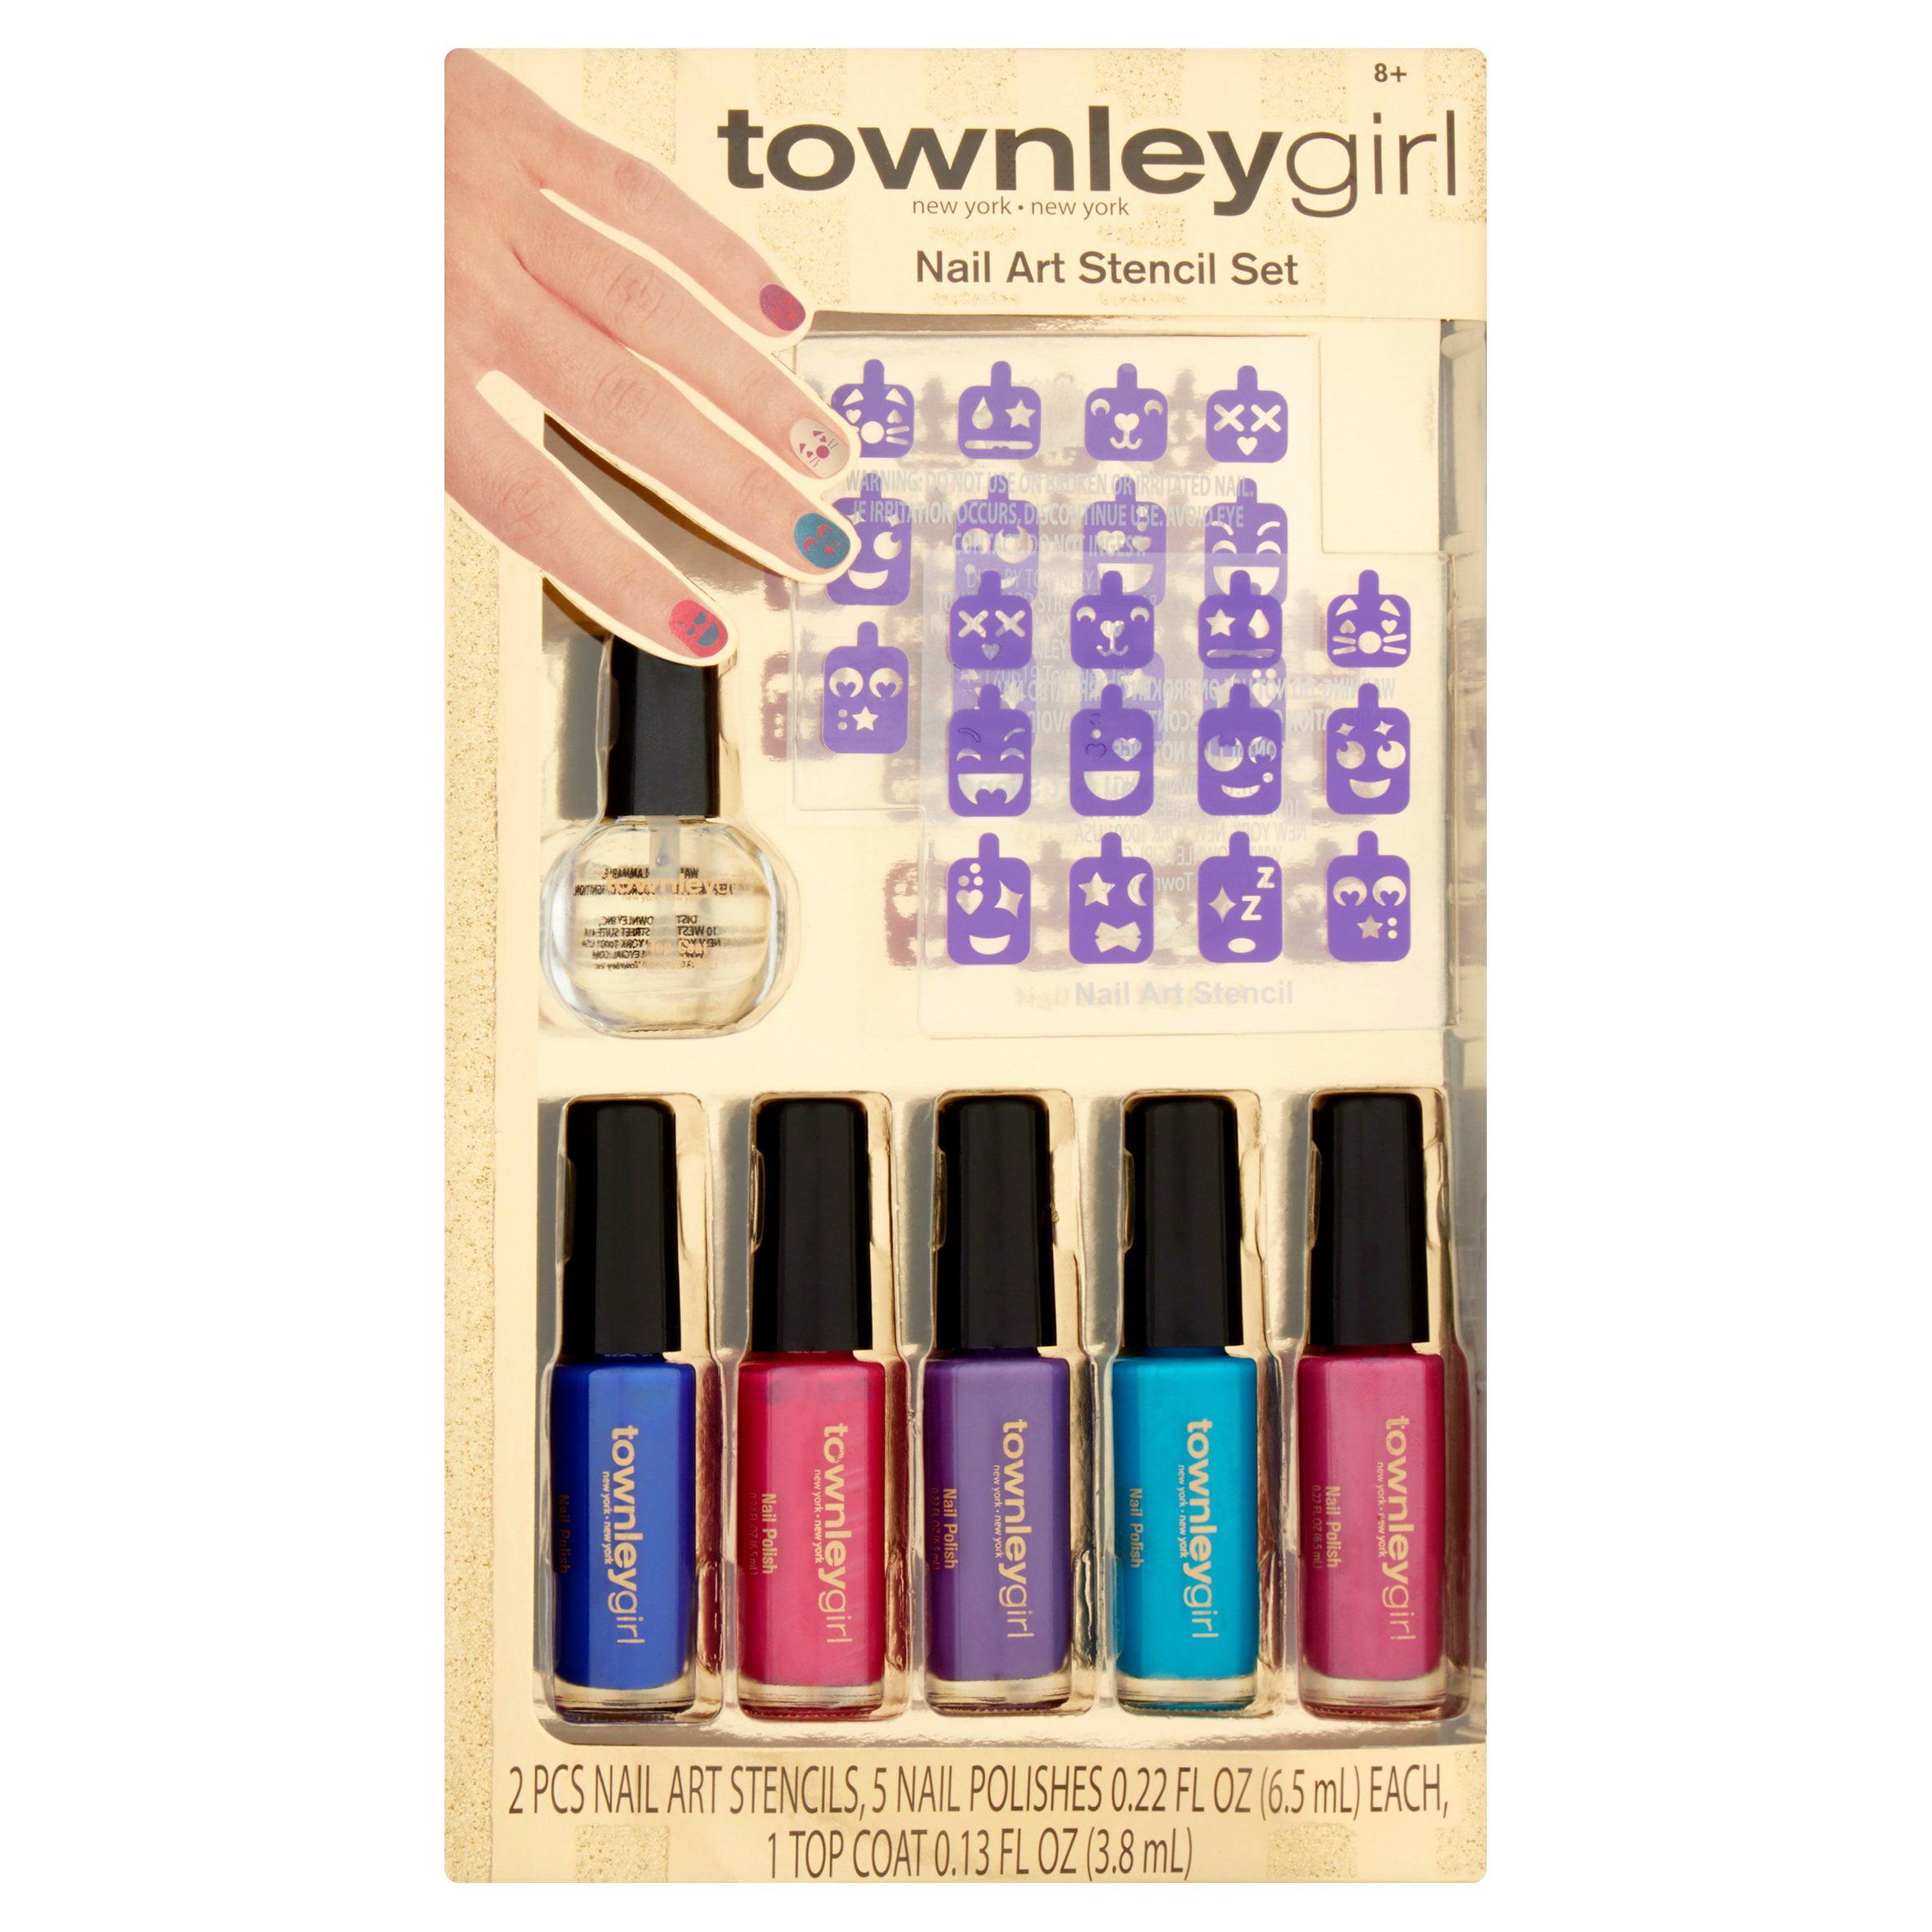 Townley Girl Nail Art Stencil Set - Walmart.com